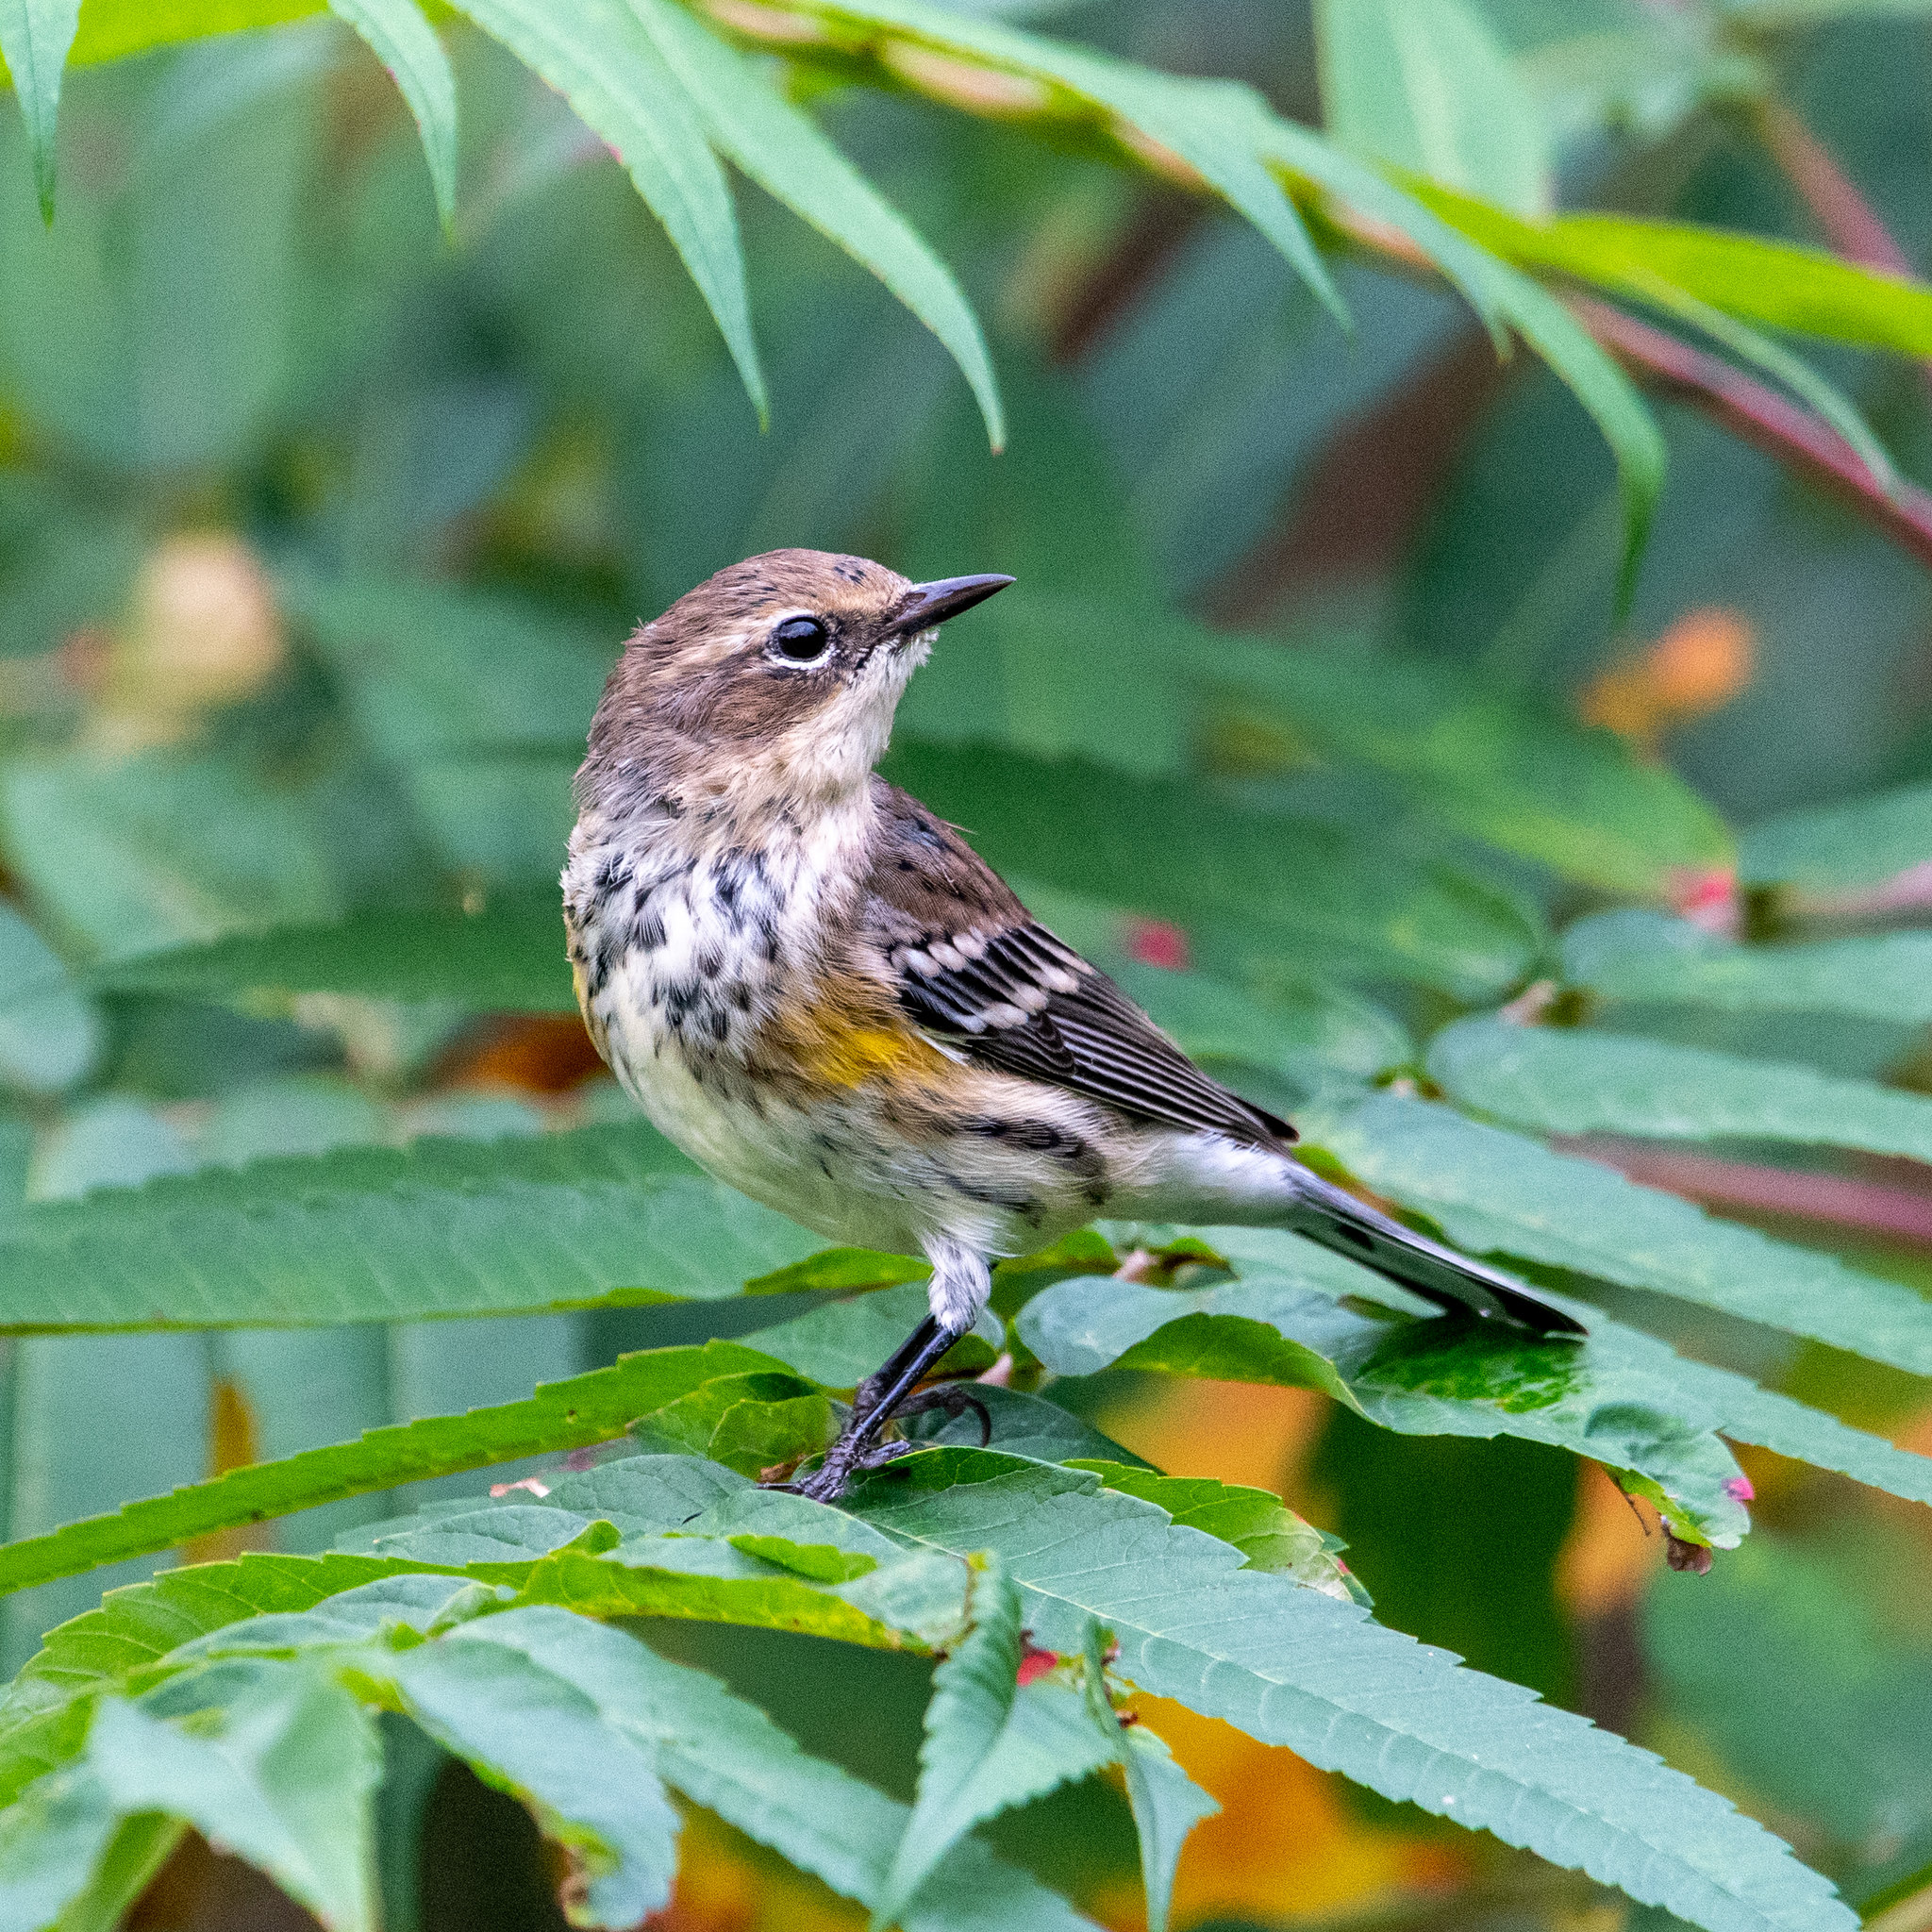 yellow-rumped-warbler-4242